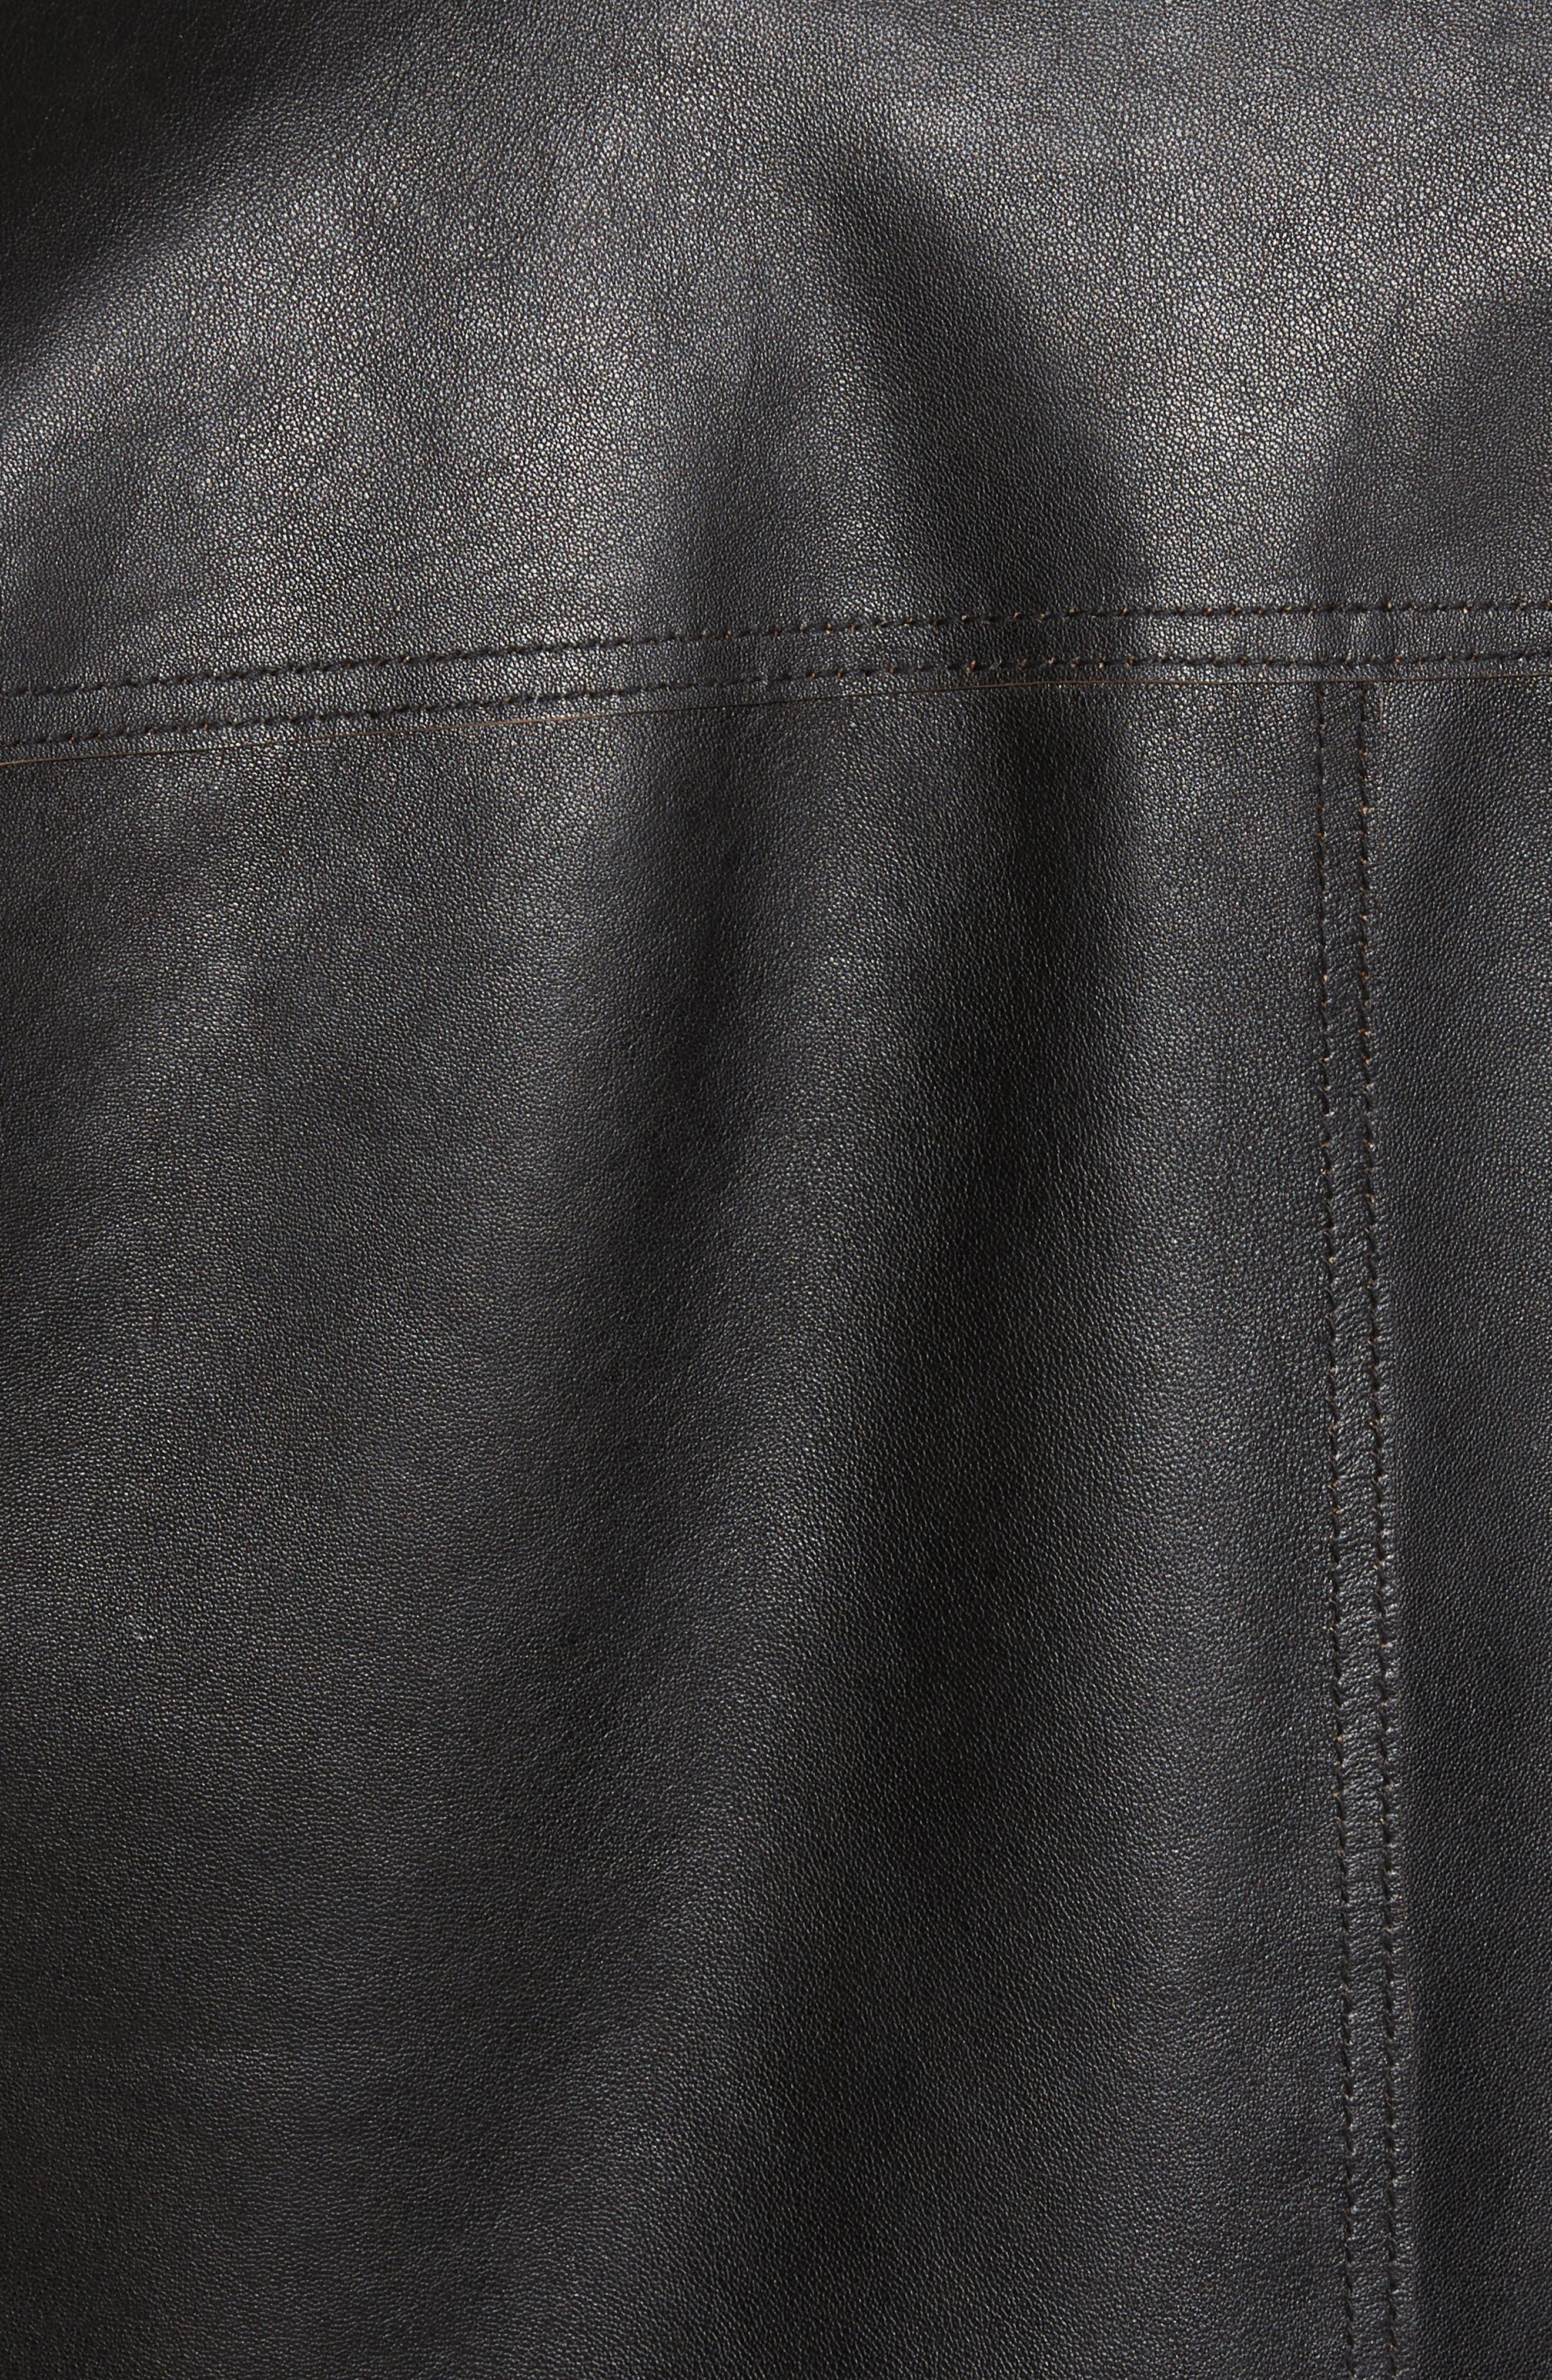 Reversible Leather Jacket,                             Alternate thumbnail 5, color,                             Black